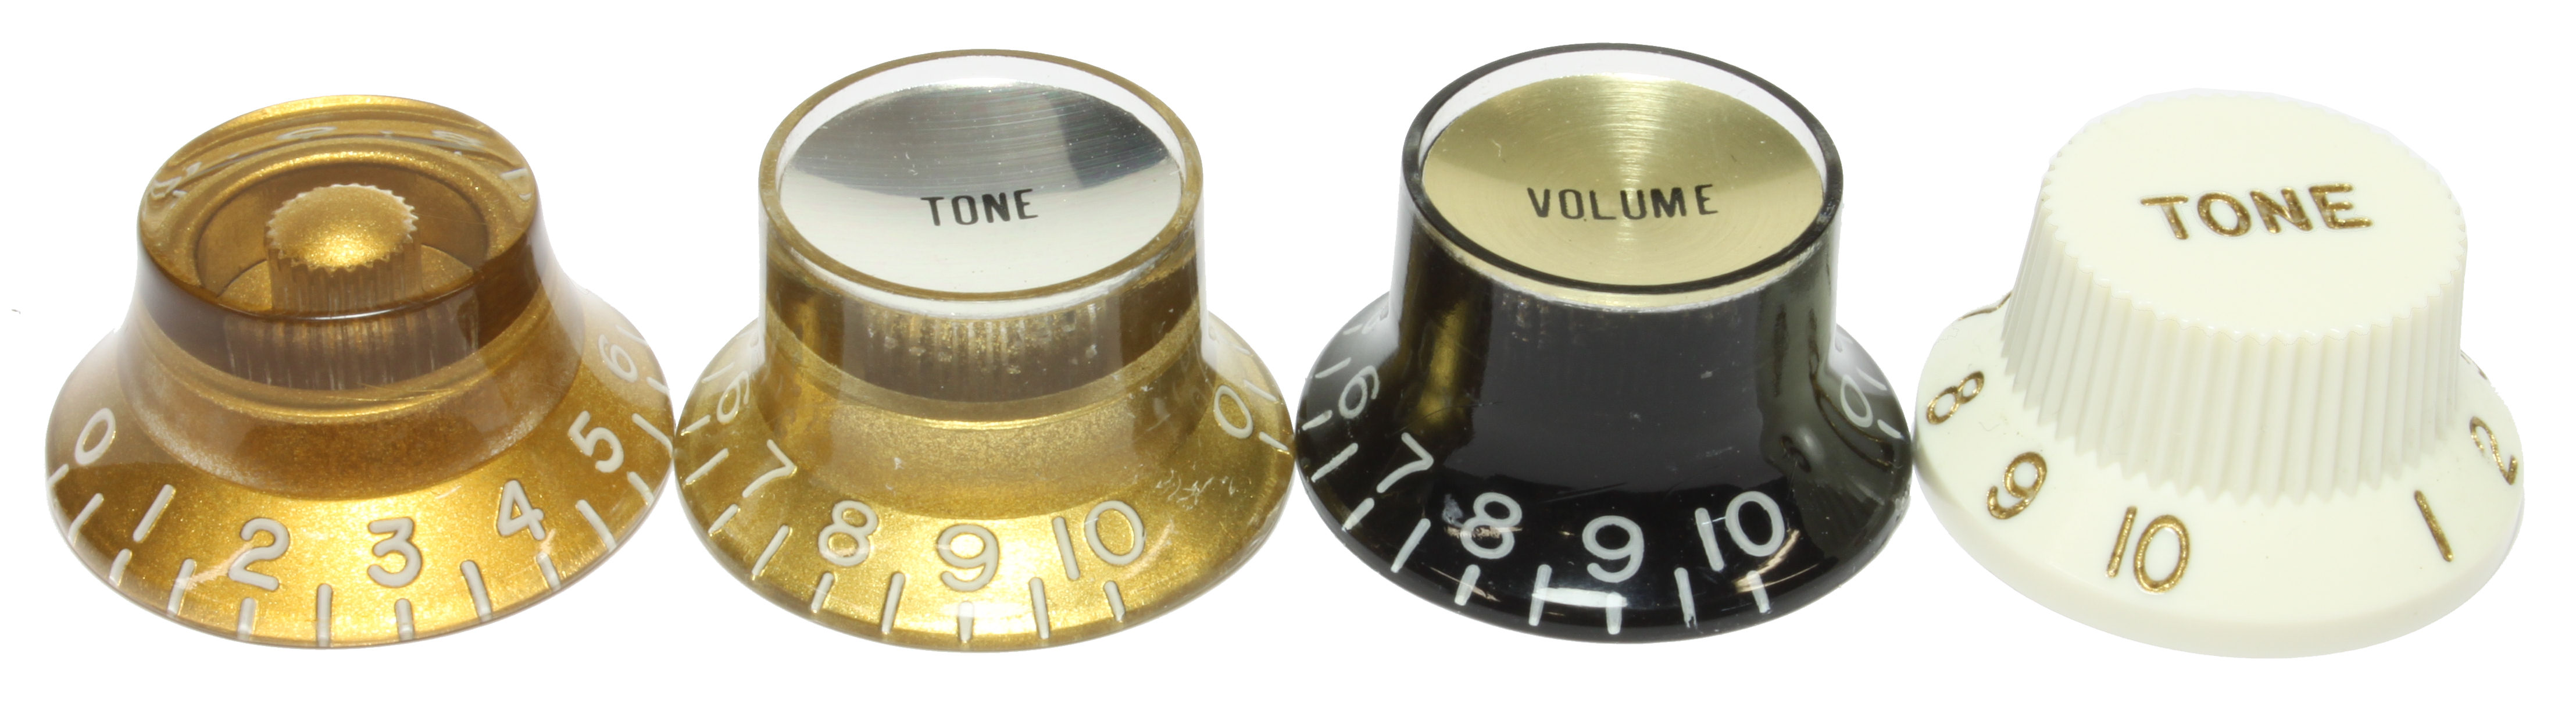 Choosing the correct knob for your guitar or bass  – Philadelphia